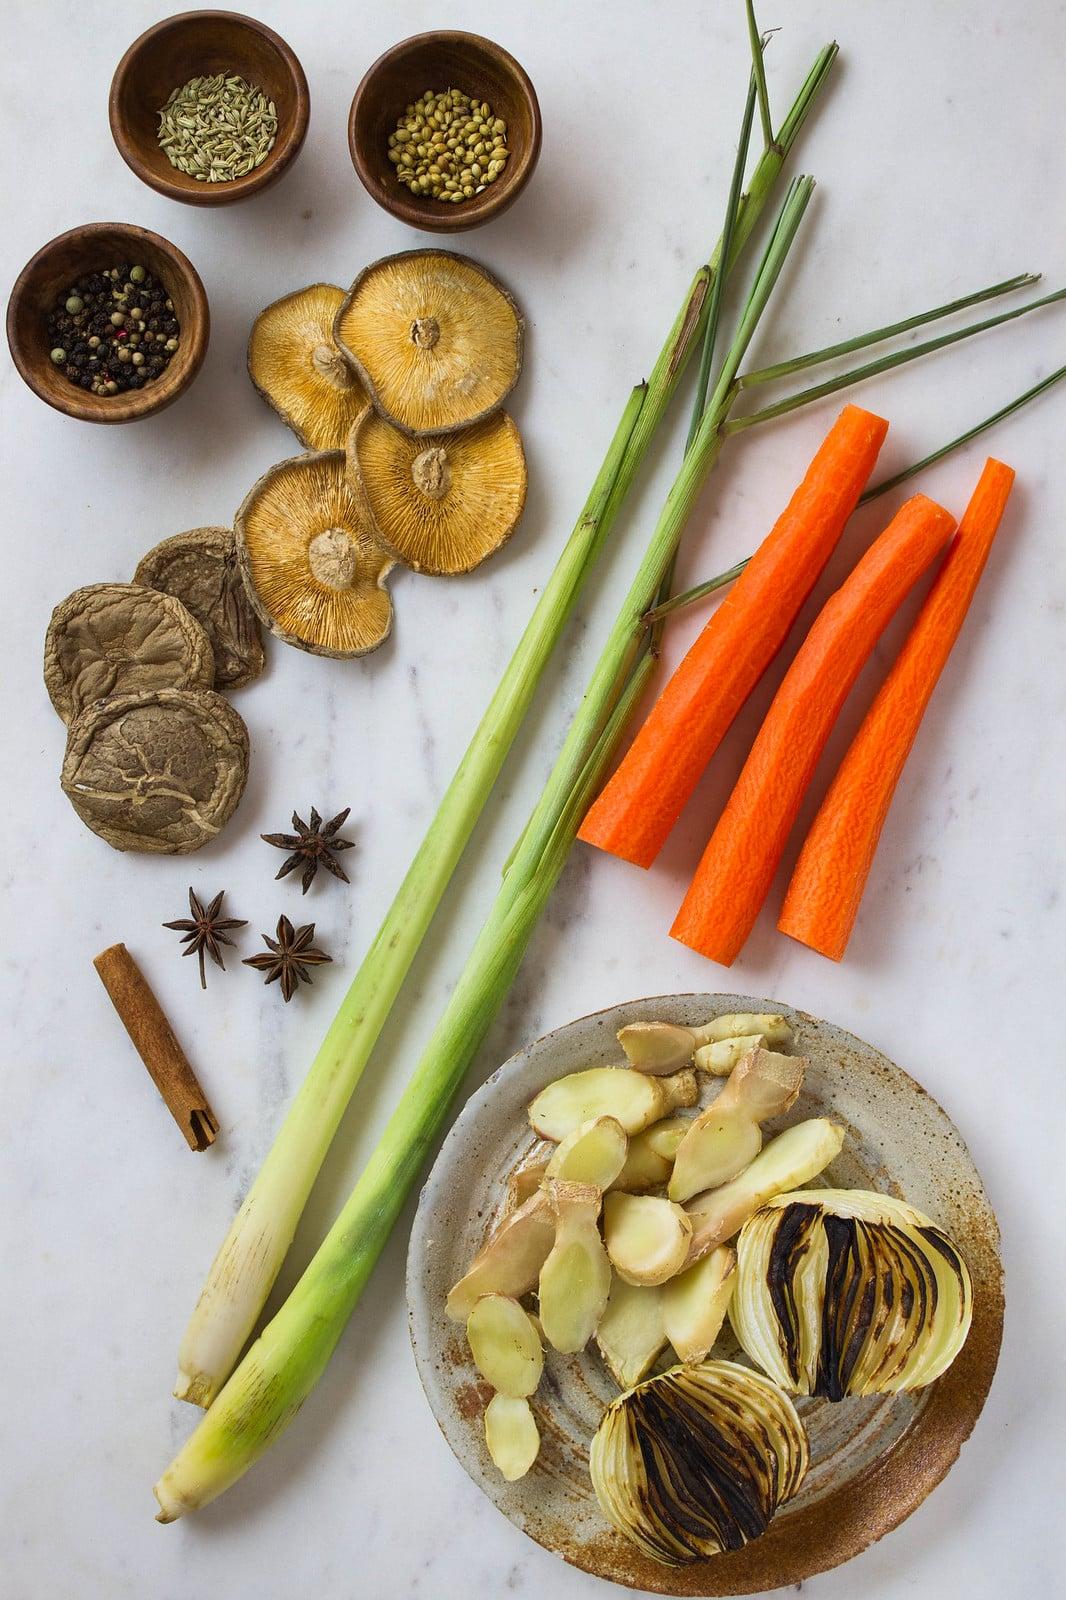 top down view of ingredients to make vegan pho broth.